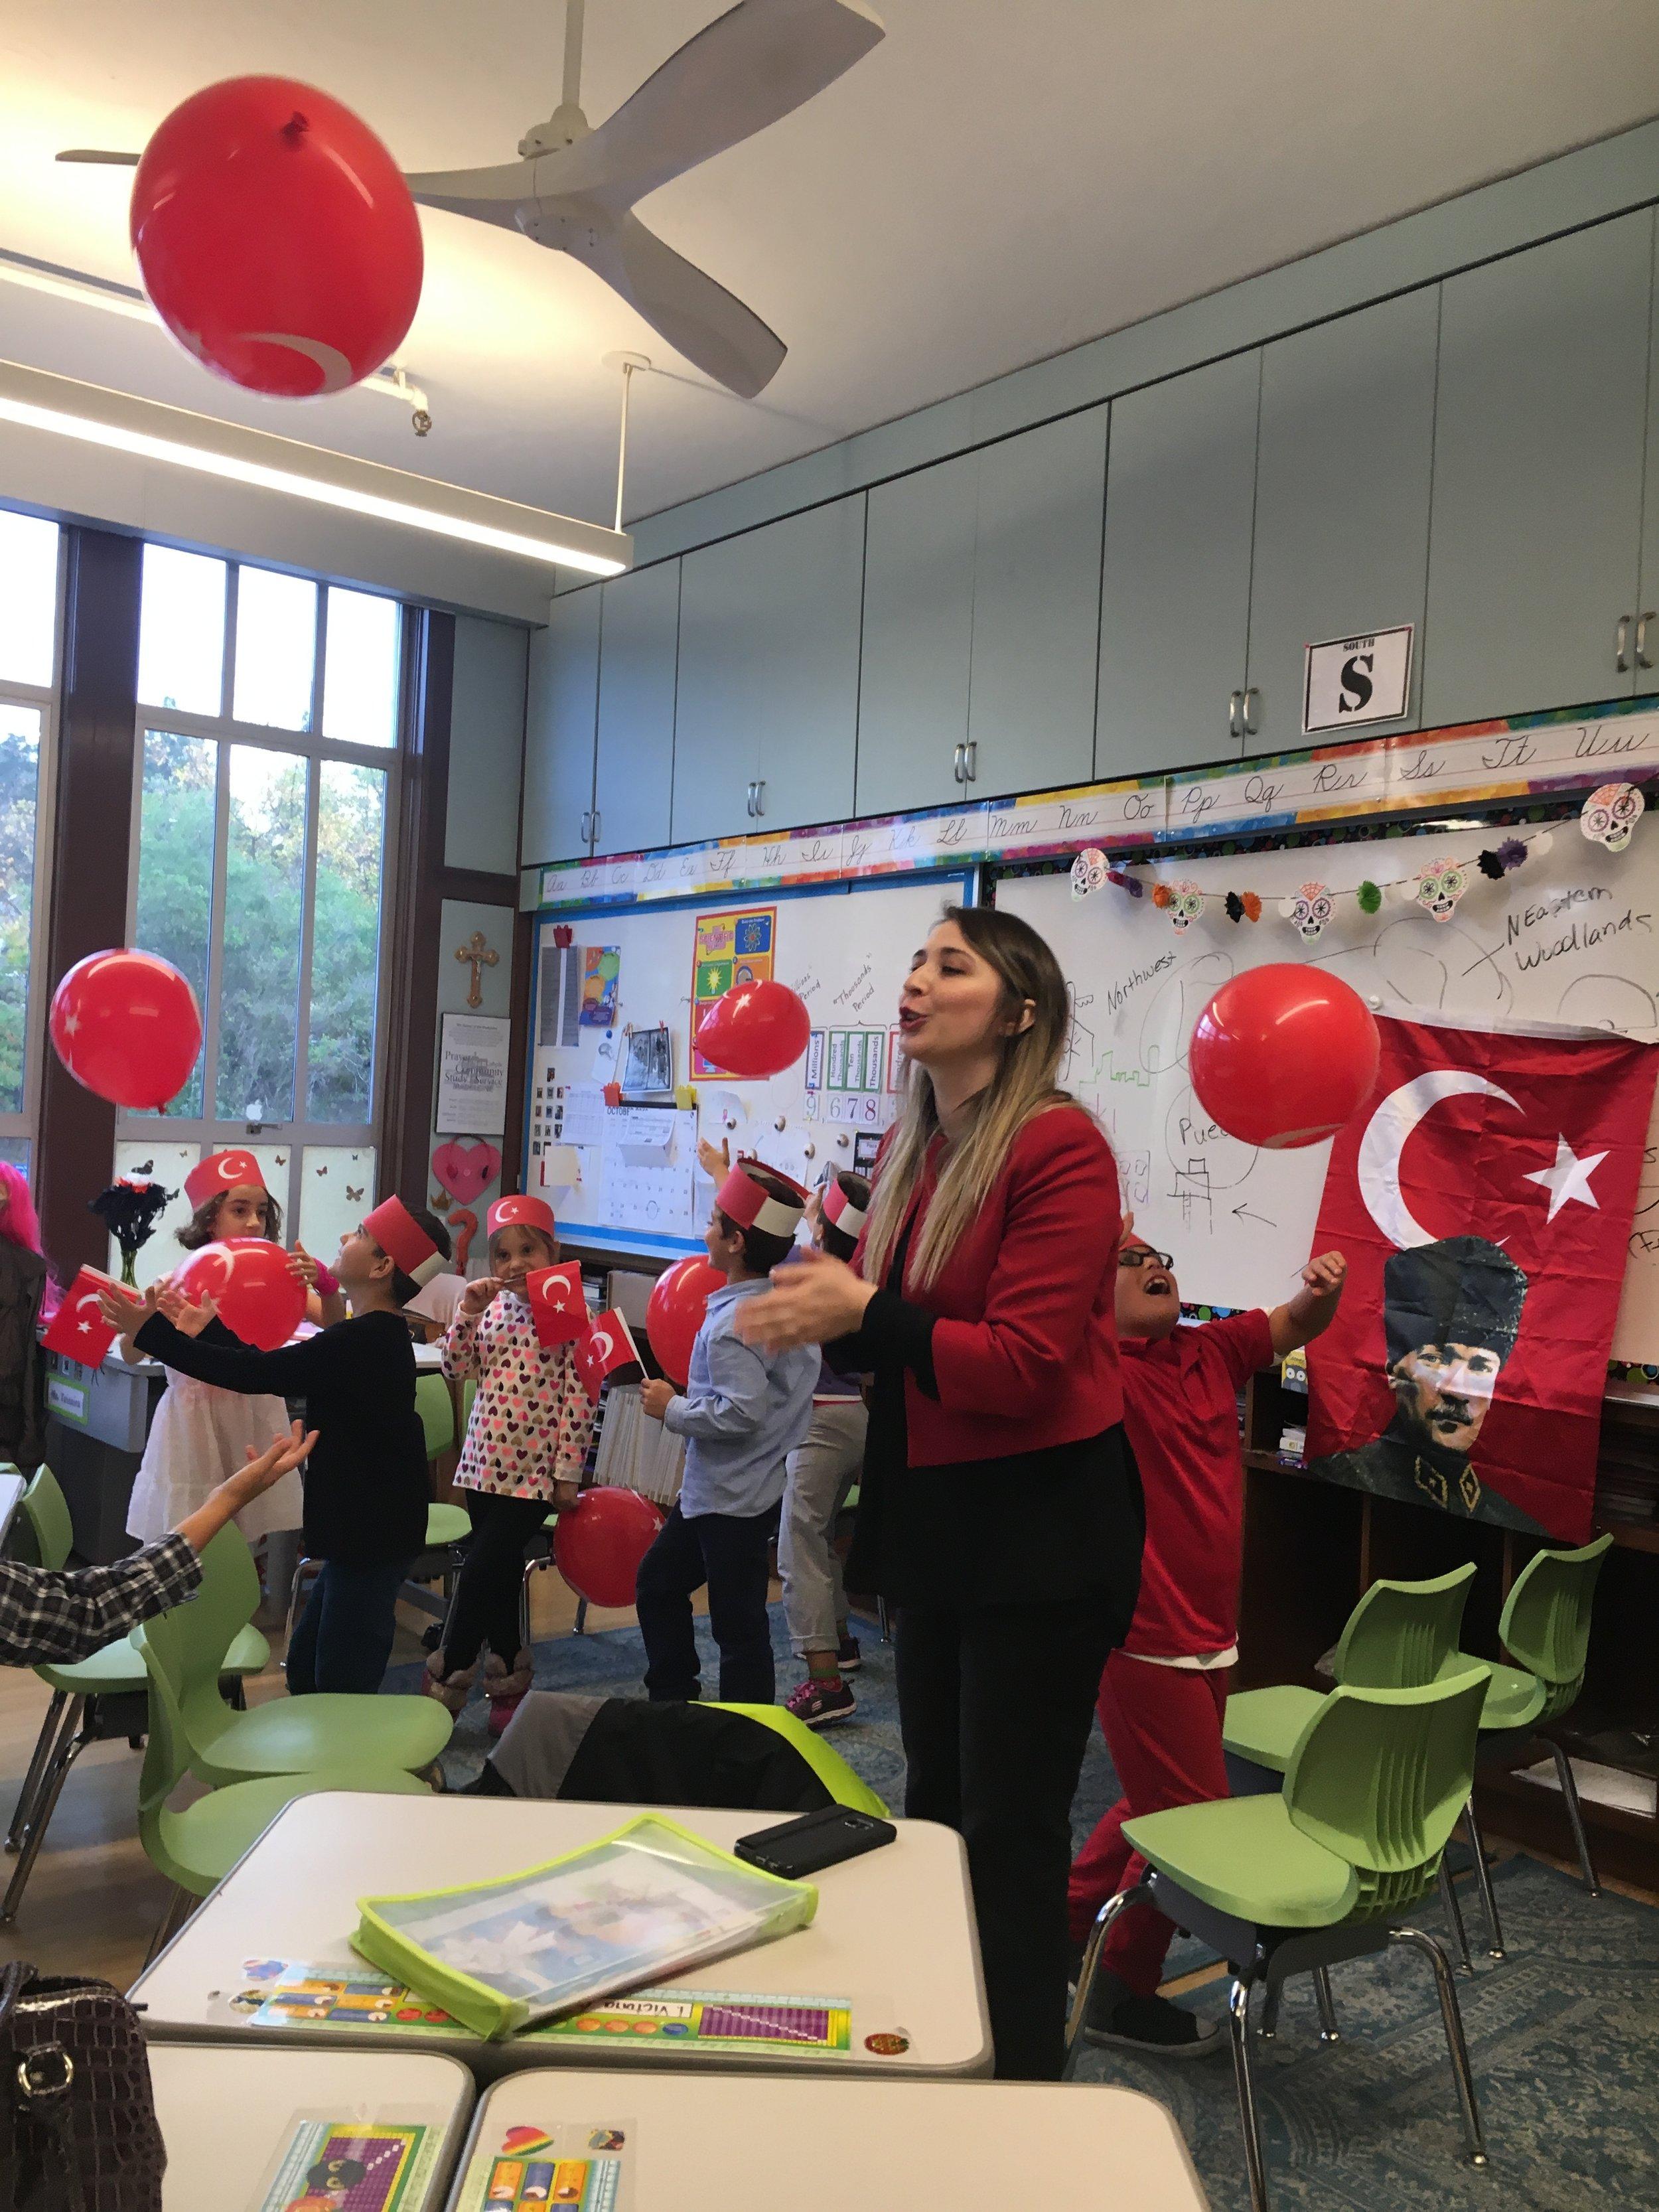 Aygegul Hanim's Cinar classroom celebrating